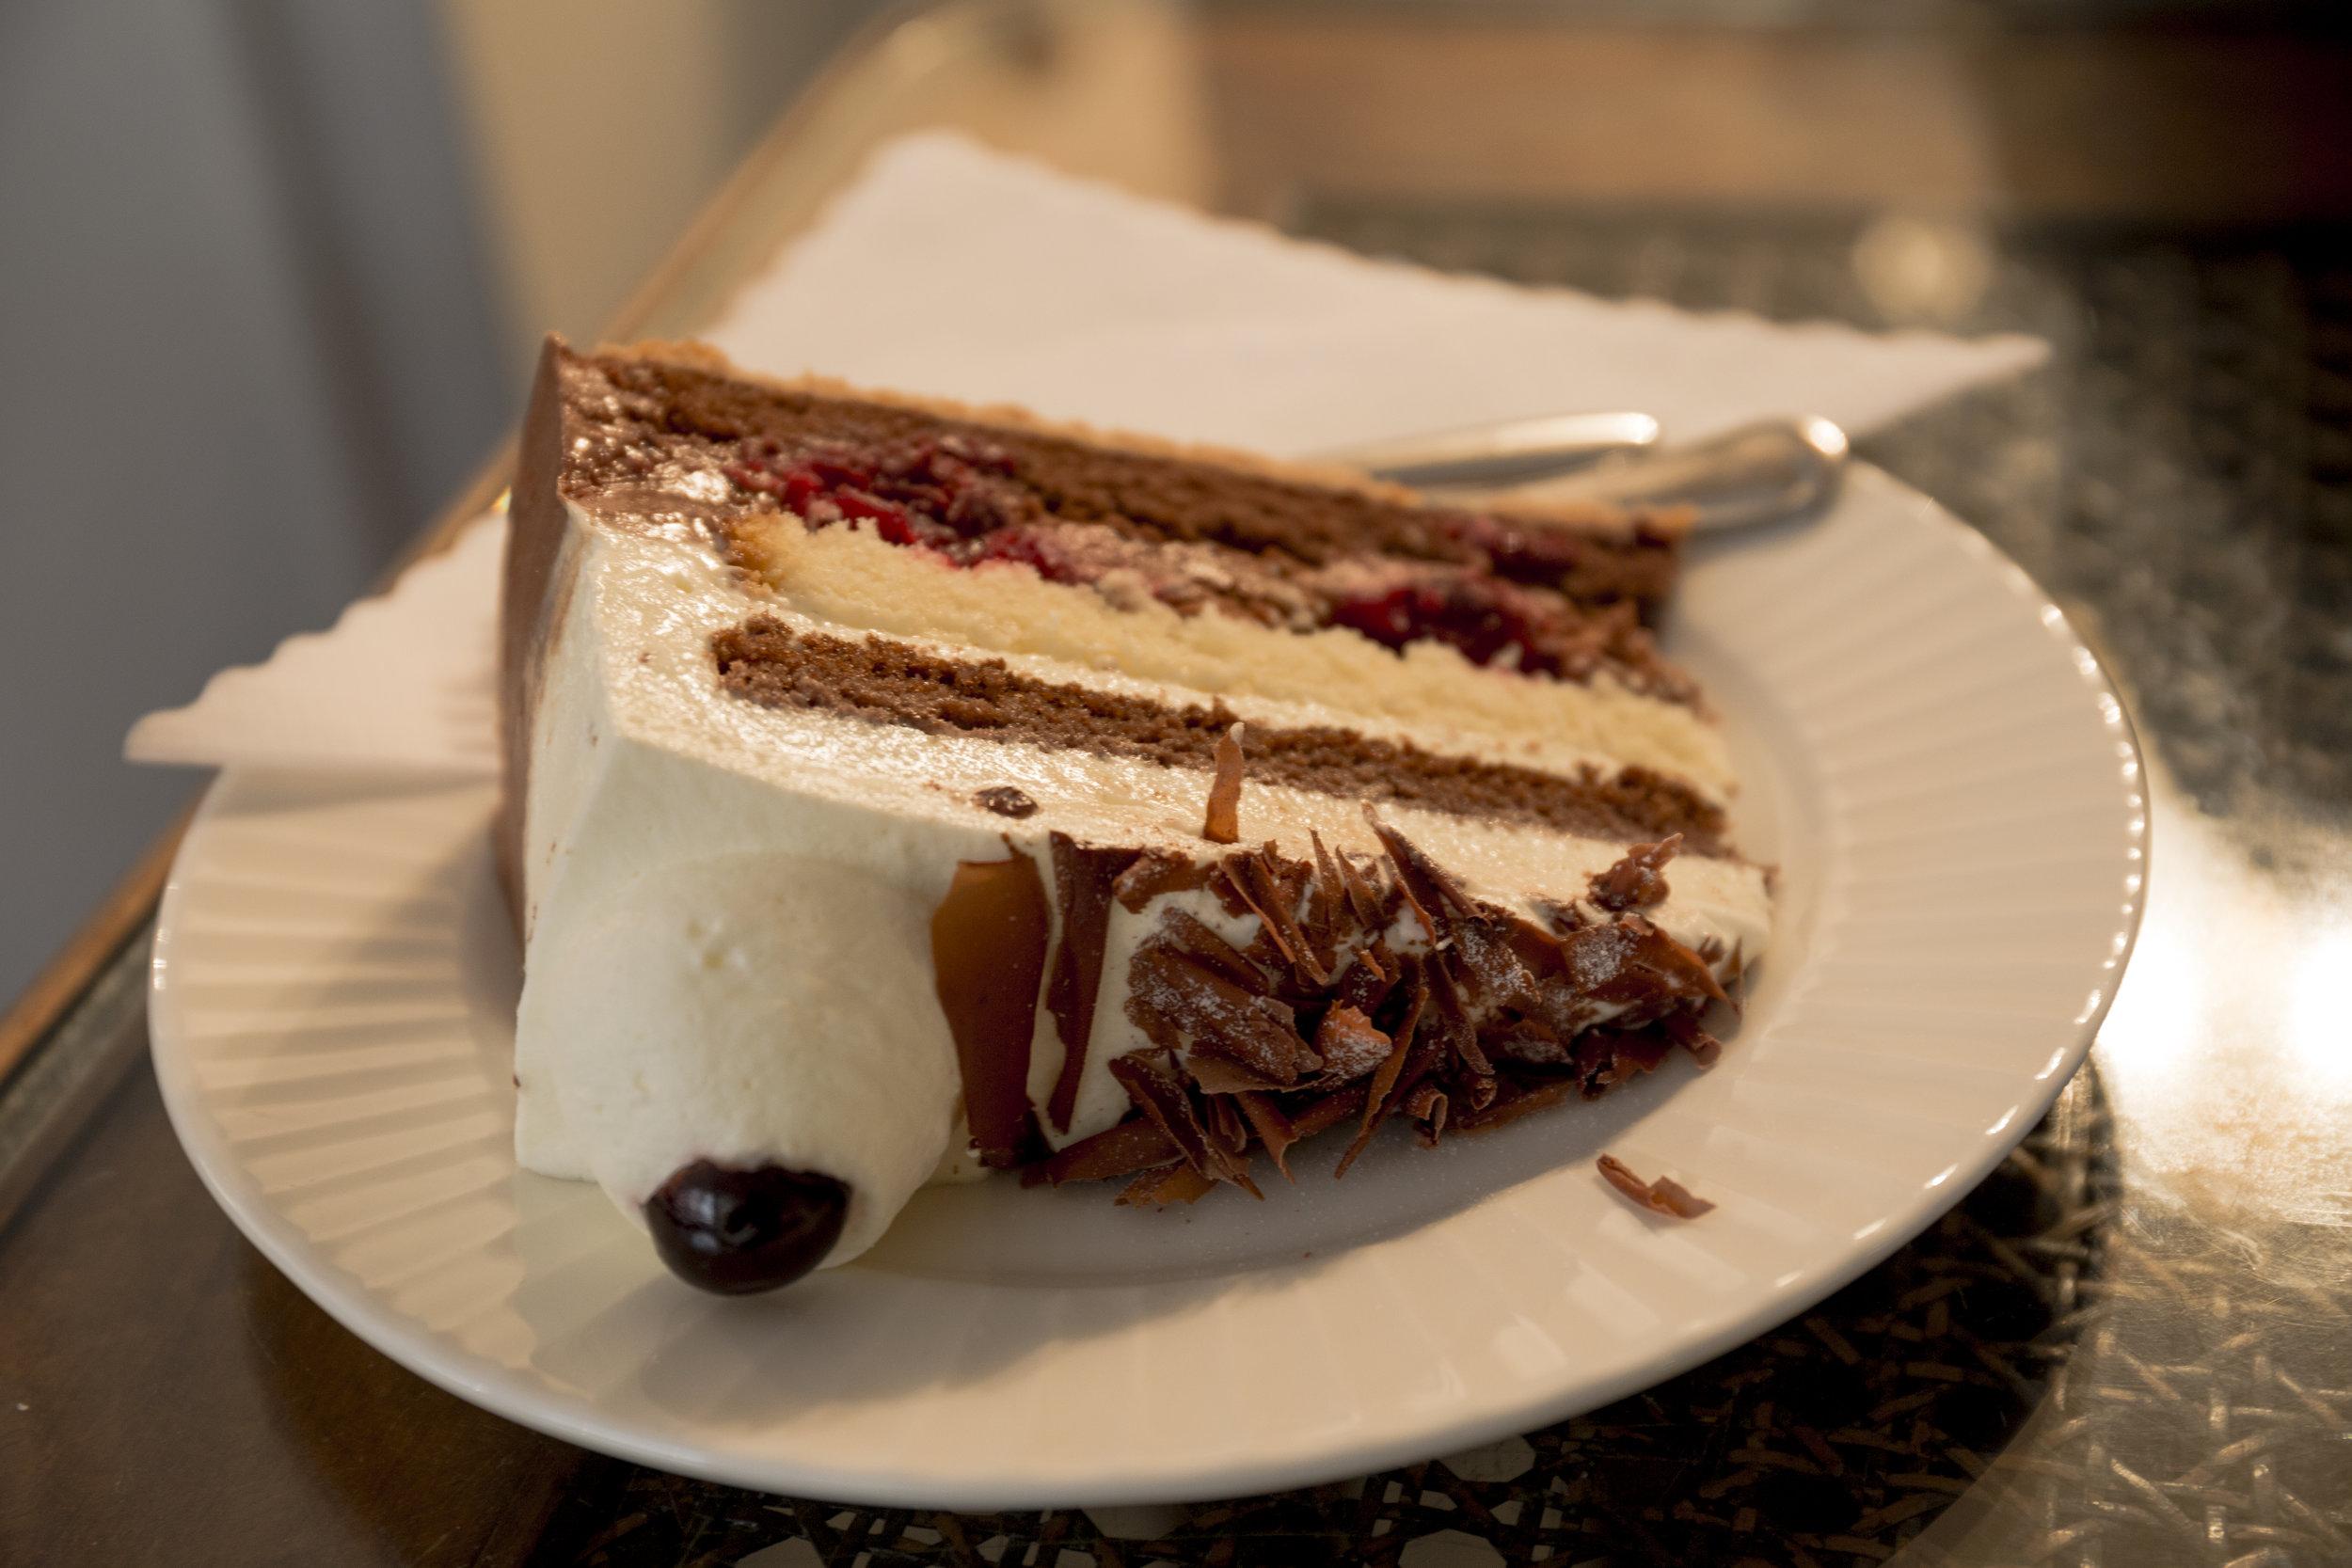 Cherry Gateaux, Café Köning